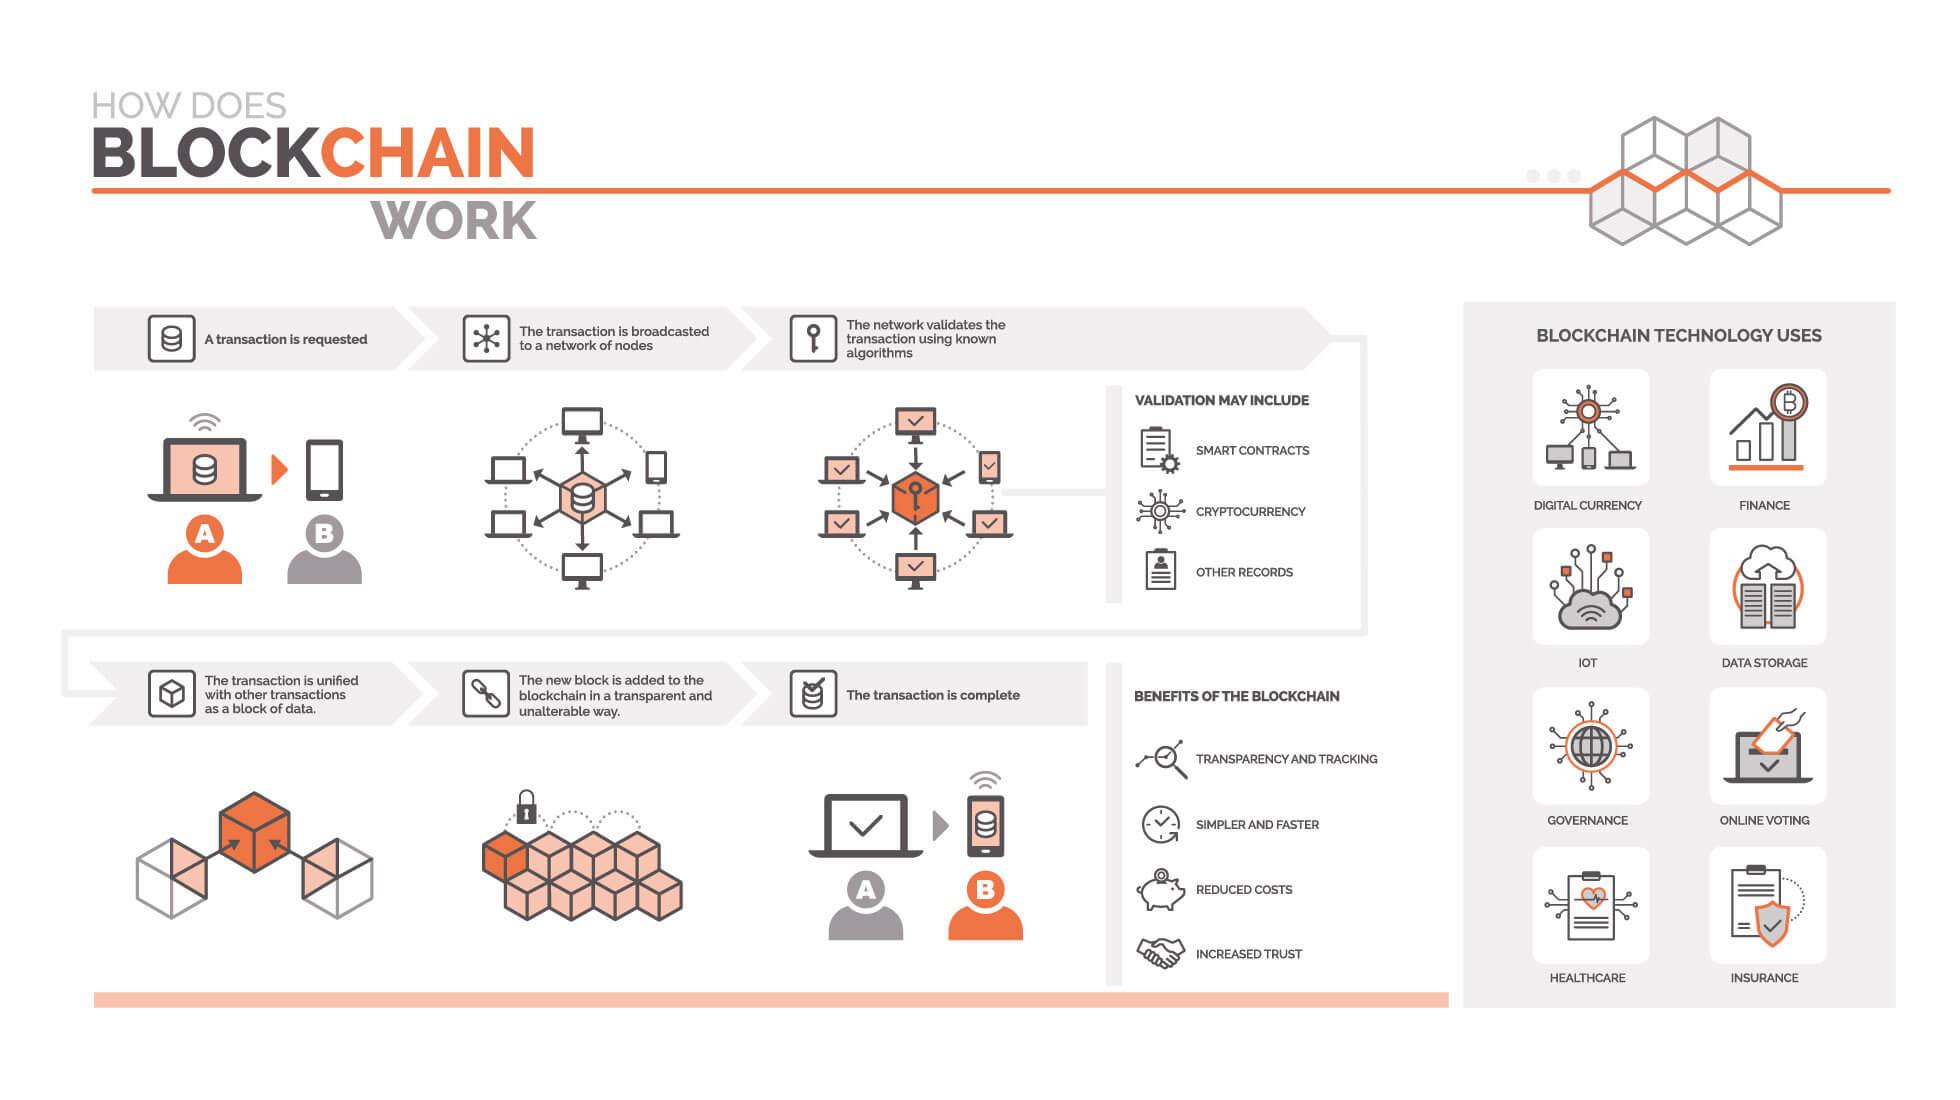 cadena bloqueo blockchain tendencias digitales coronavirus sm digital